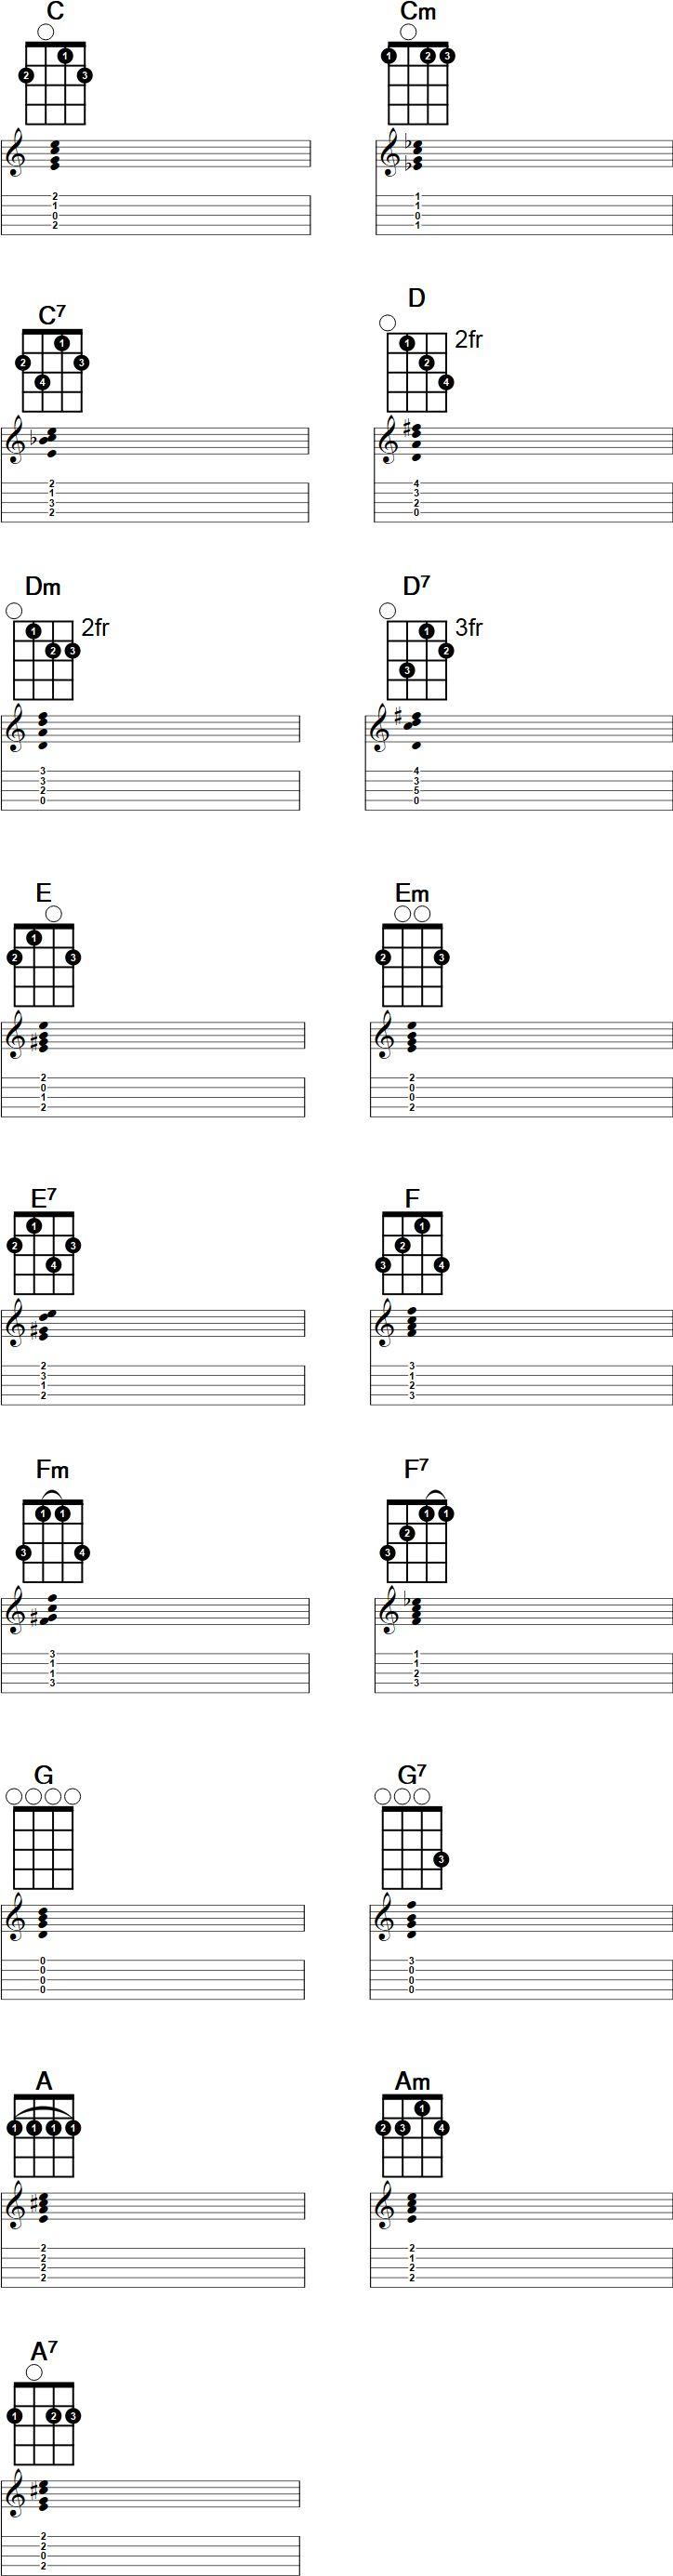 Easy Banjo Chords - Printable PDF download at http://banjochords.net/chords/easy/